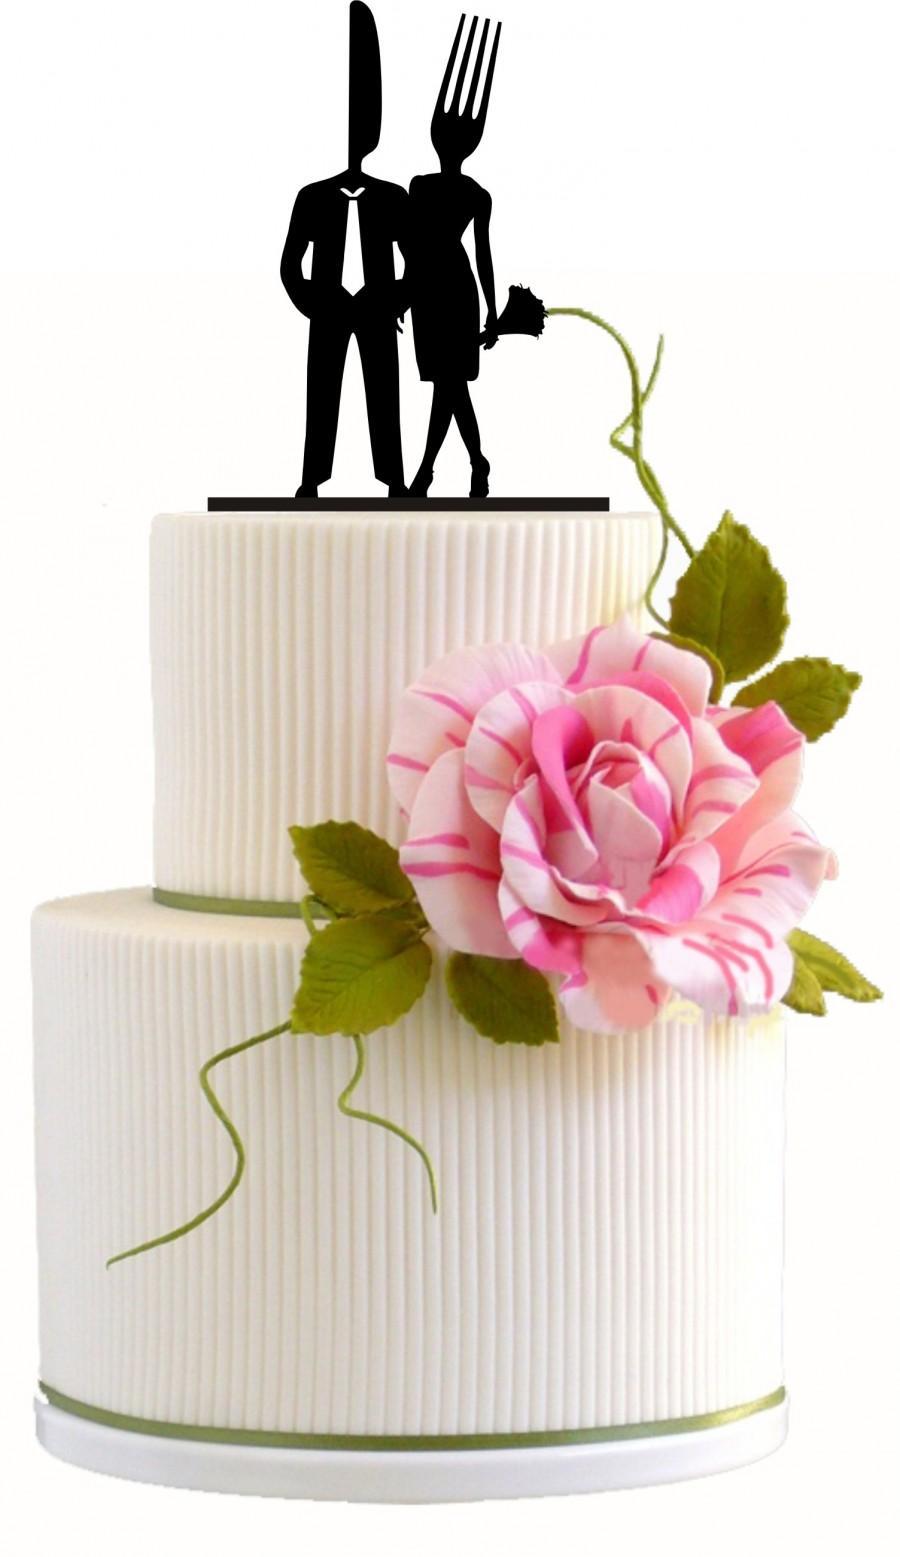 Wedding Cake Topper Silhouette / Cake Lover #2392102 - Weddbook